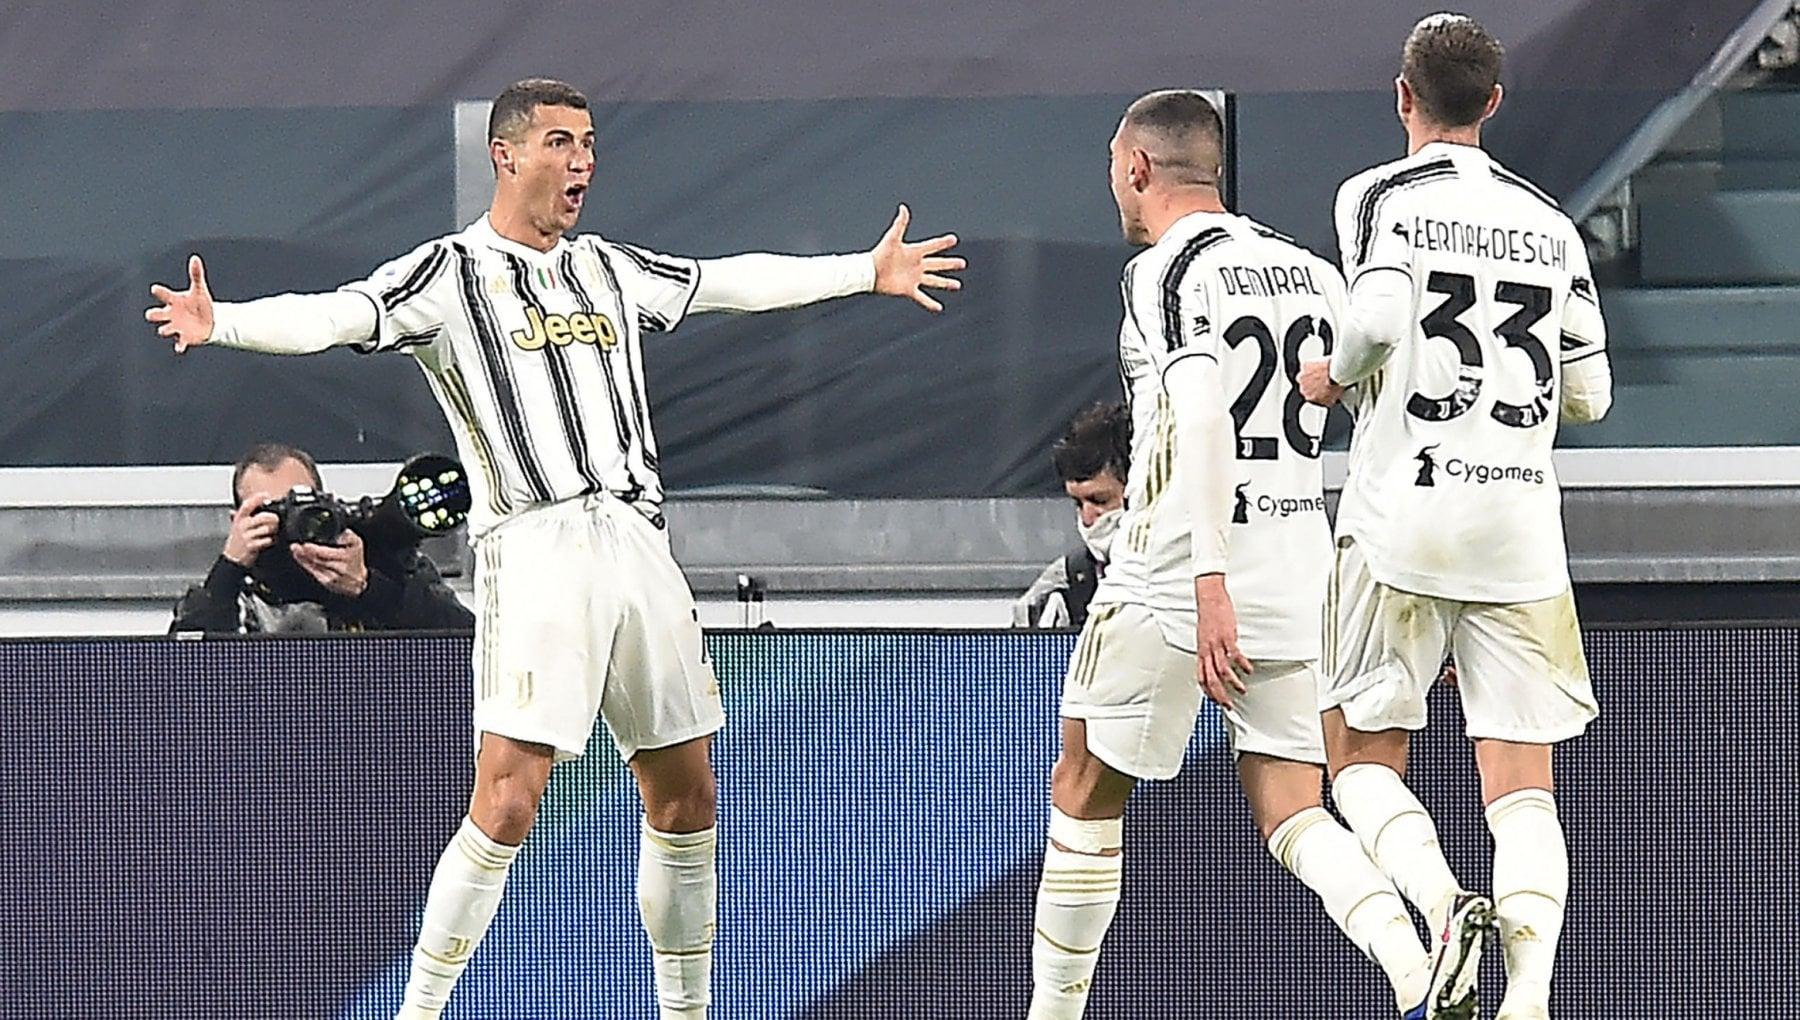 Juventus Cagliari 2 0 doppietta di Ronaldo bianconeri a 1 dal Milan